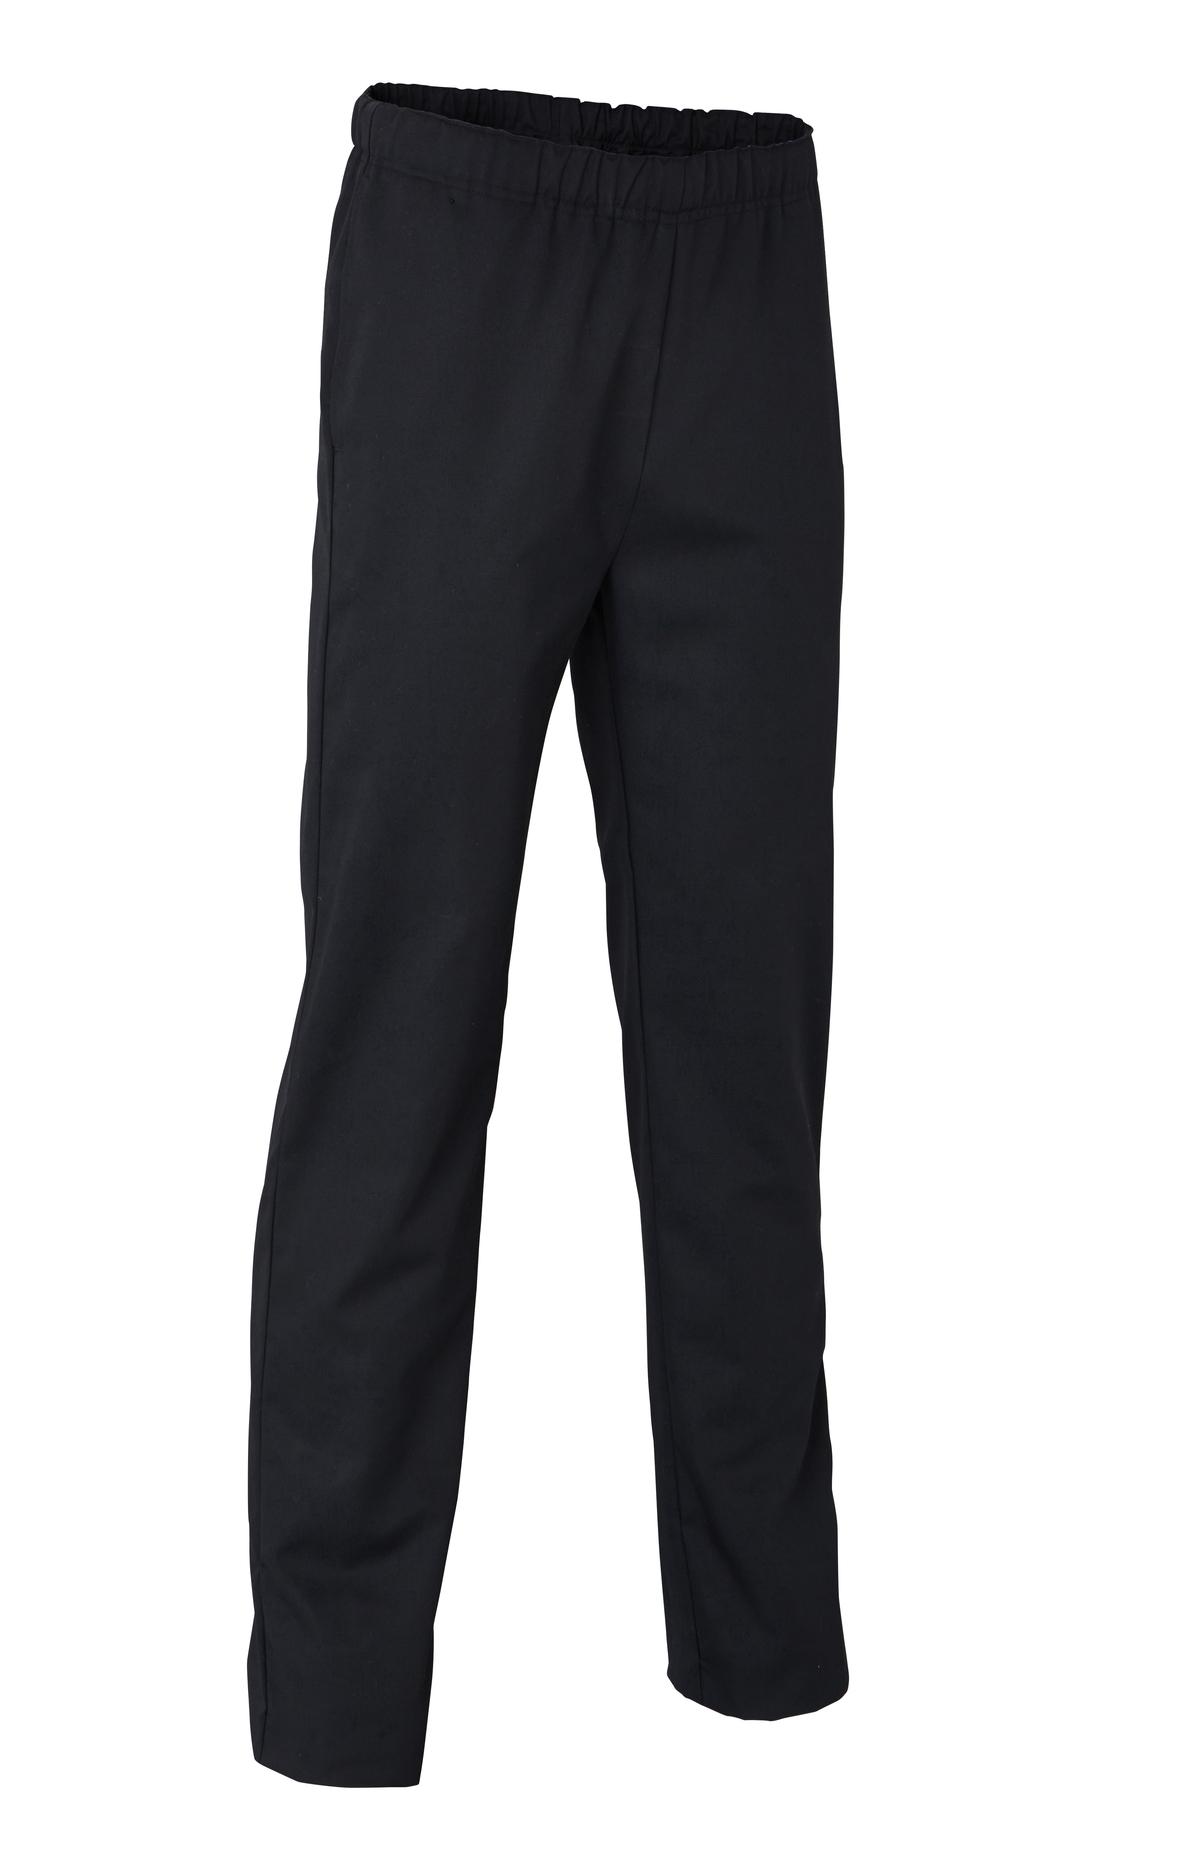 Pantalon noir taille 3 Promys Molinel